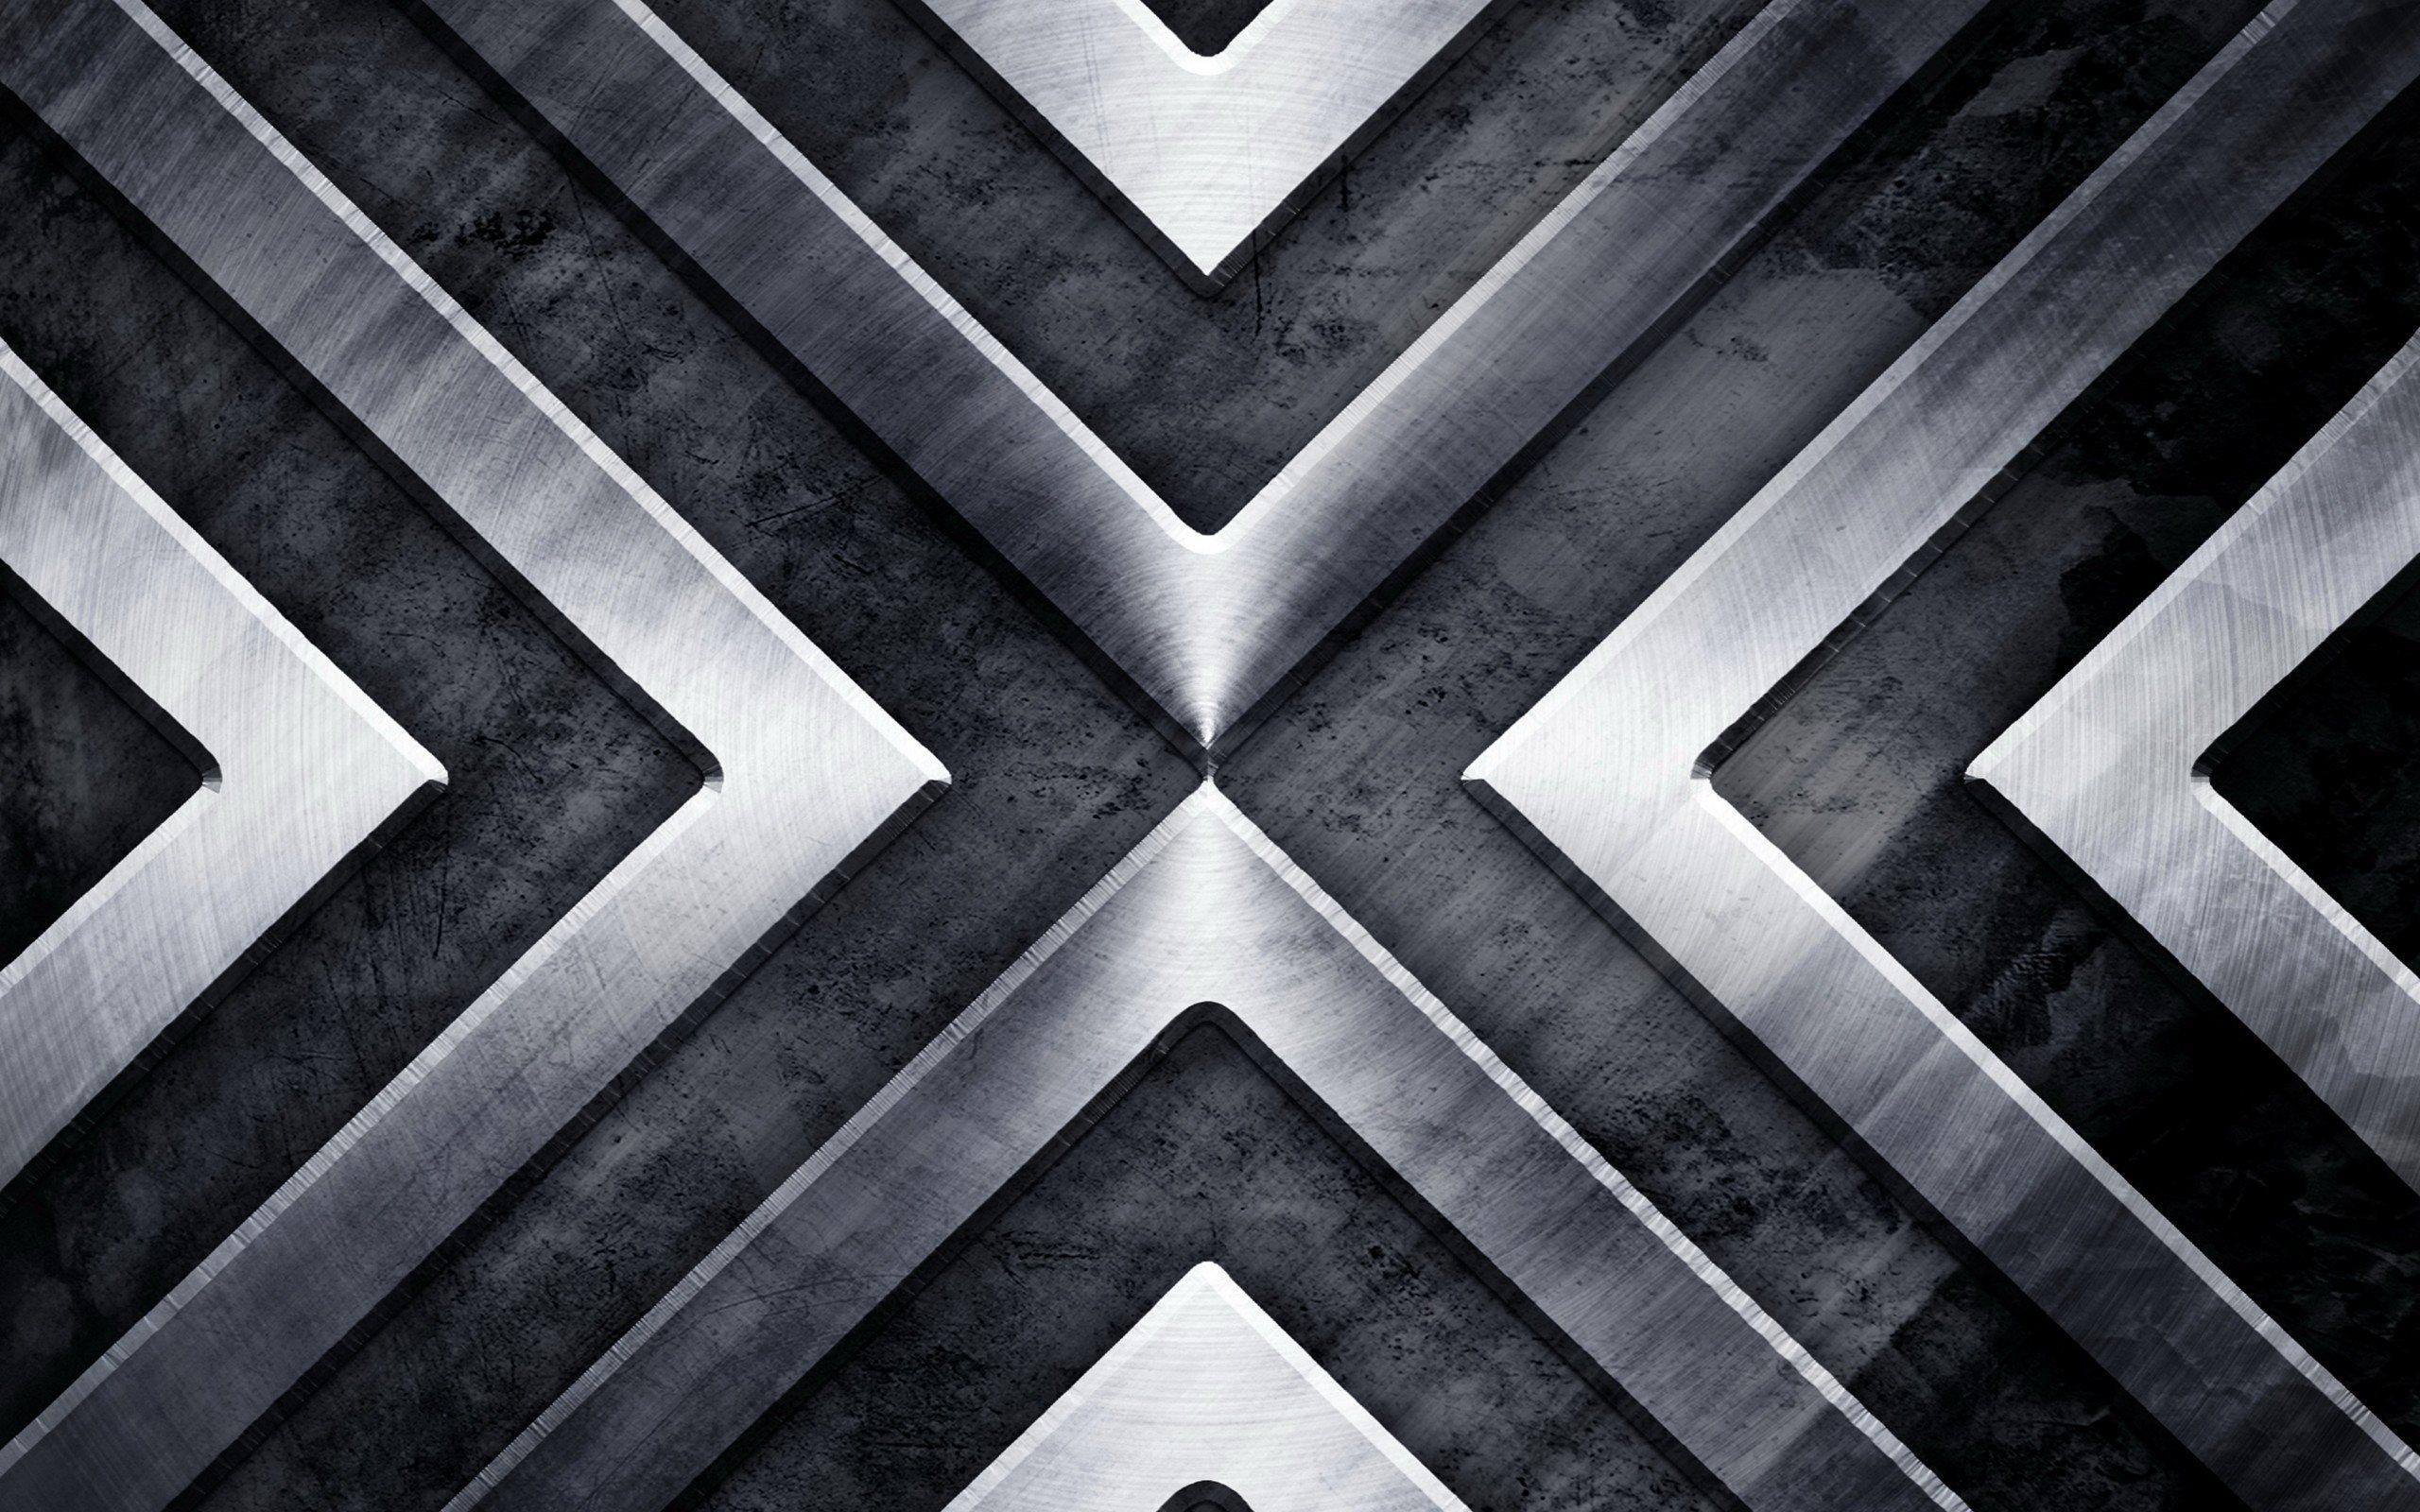 Metallic background photo